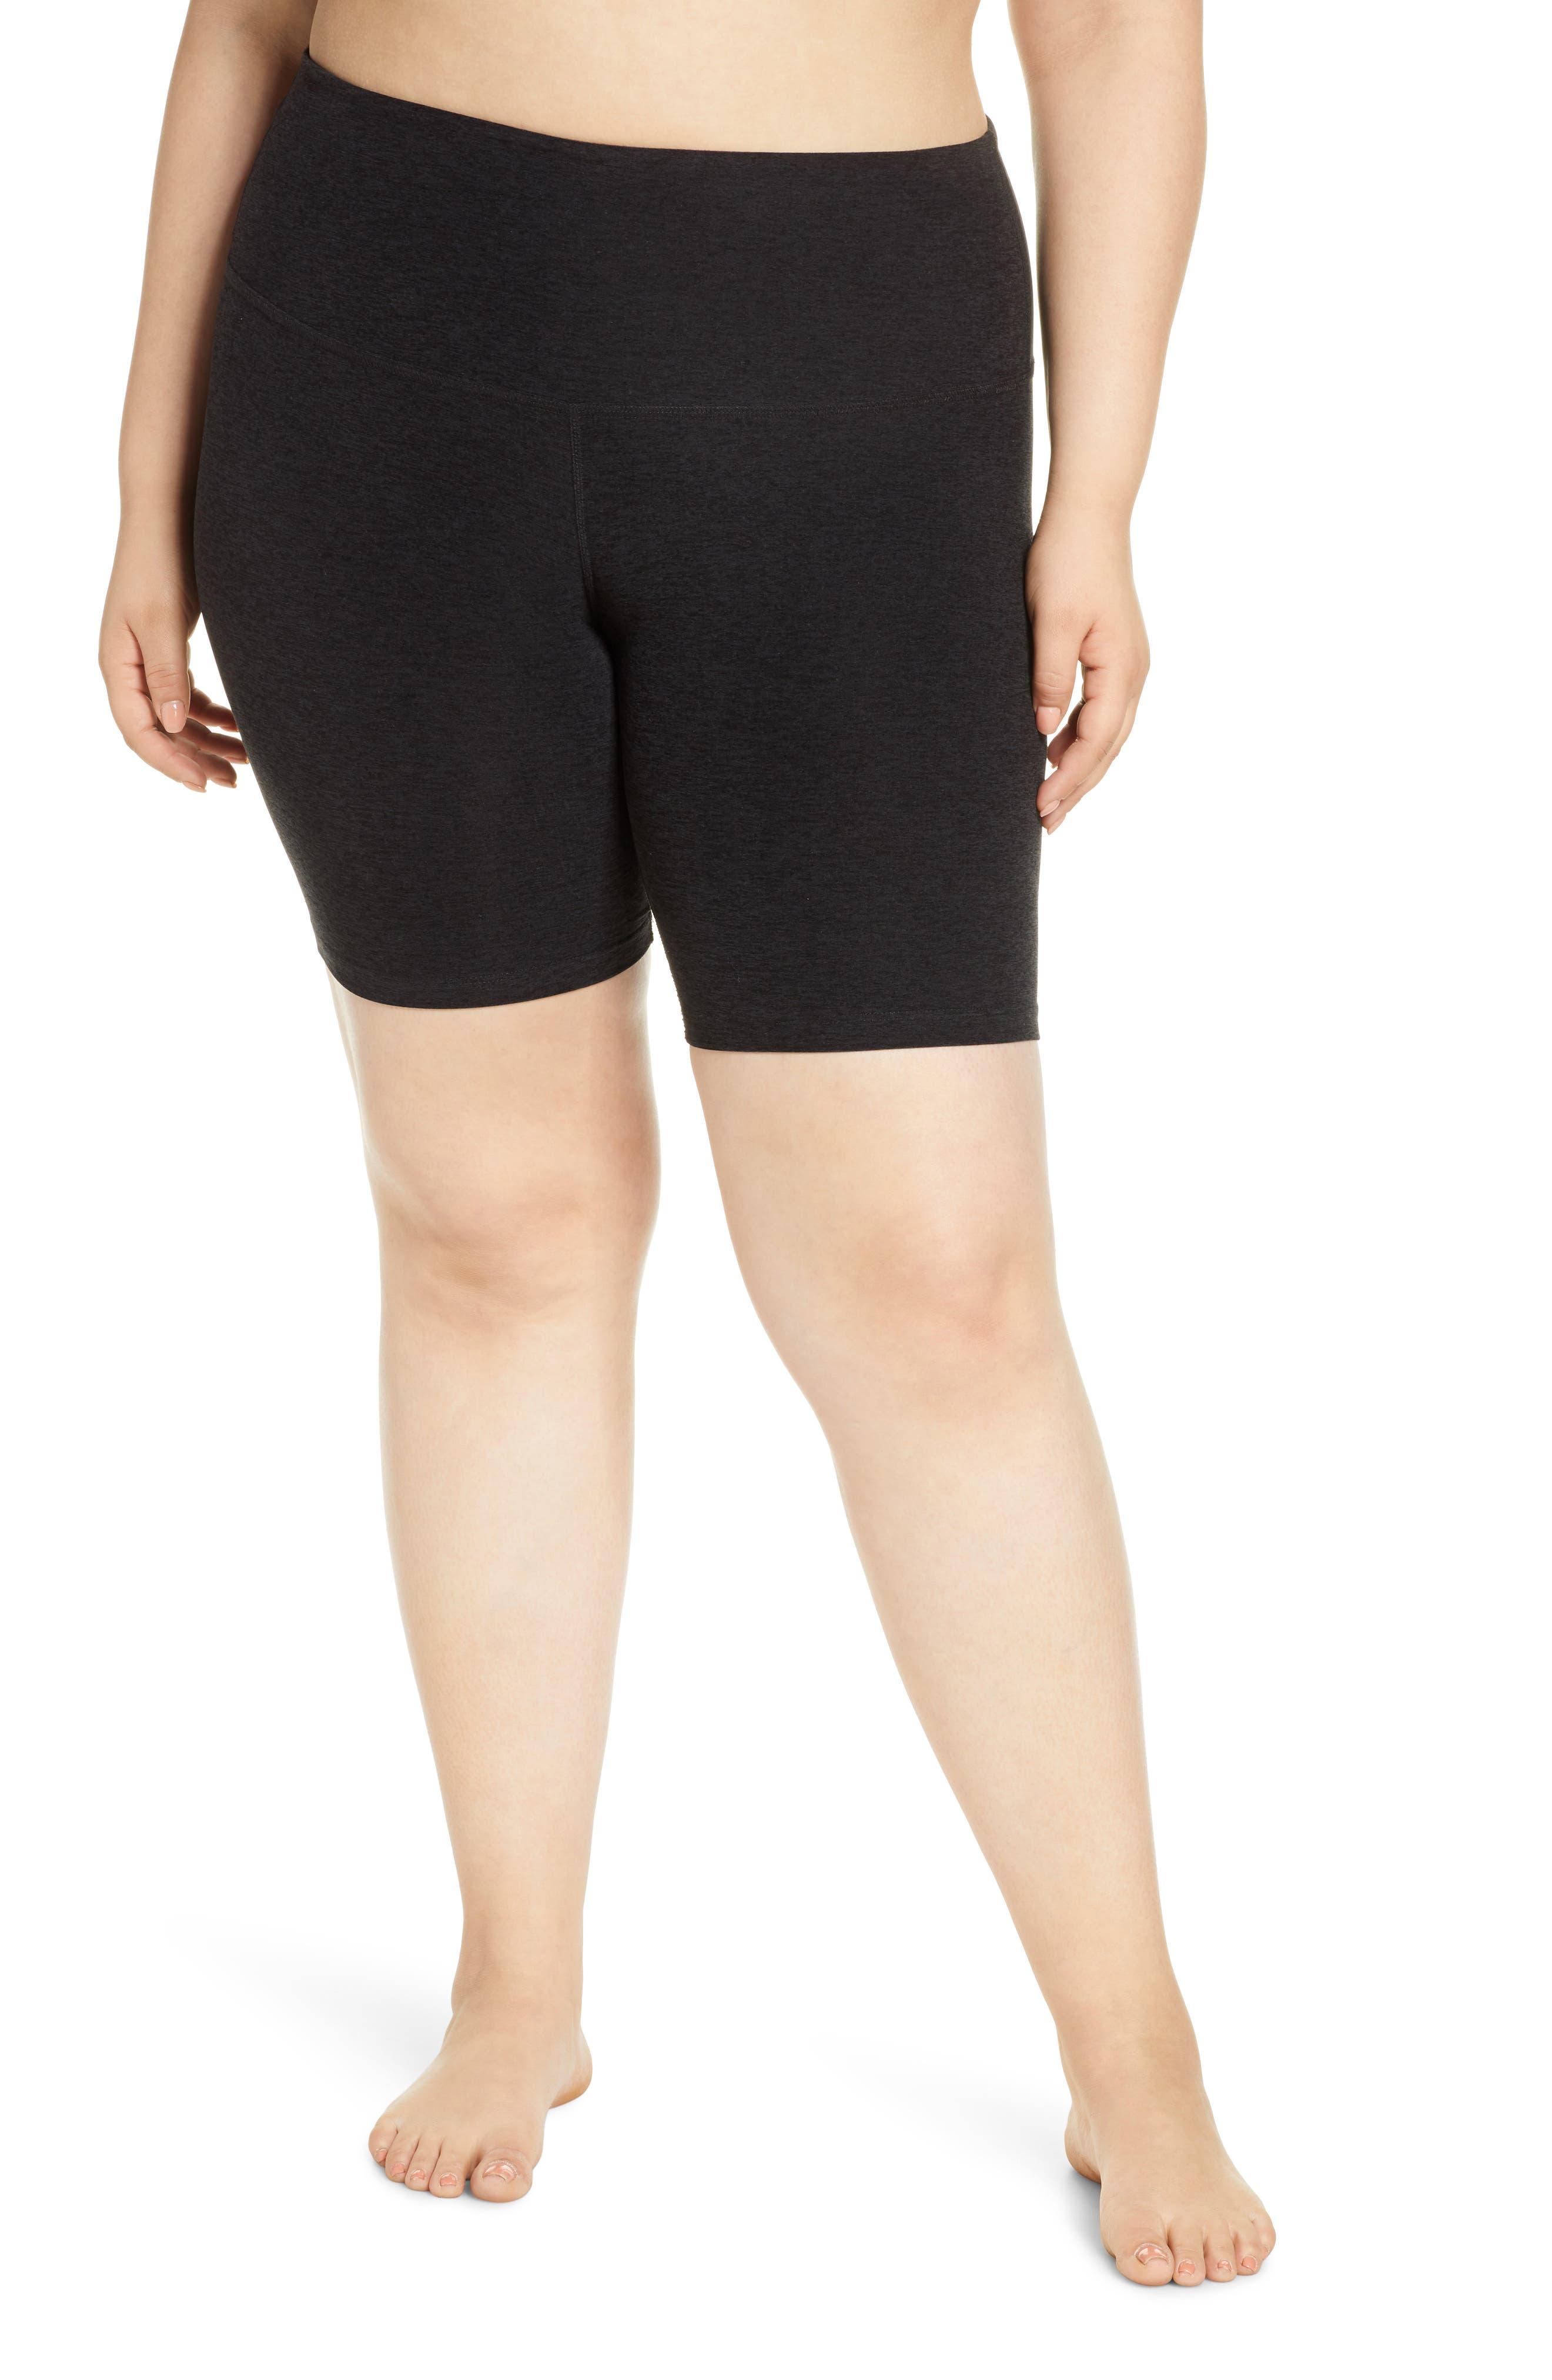 Plus Women's Beyond Yoga High Waist Bopo Bike Shorts